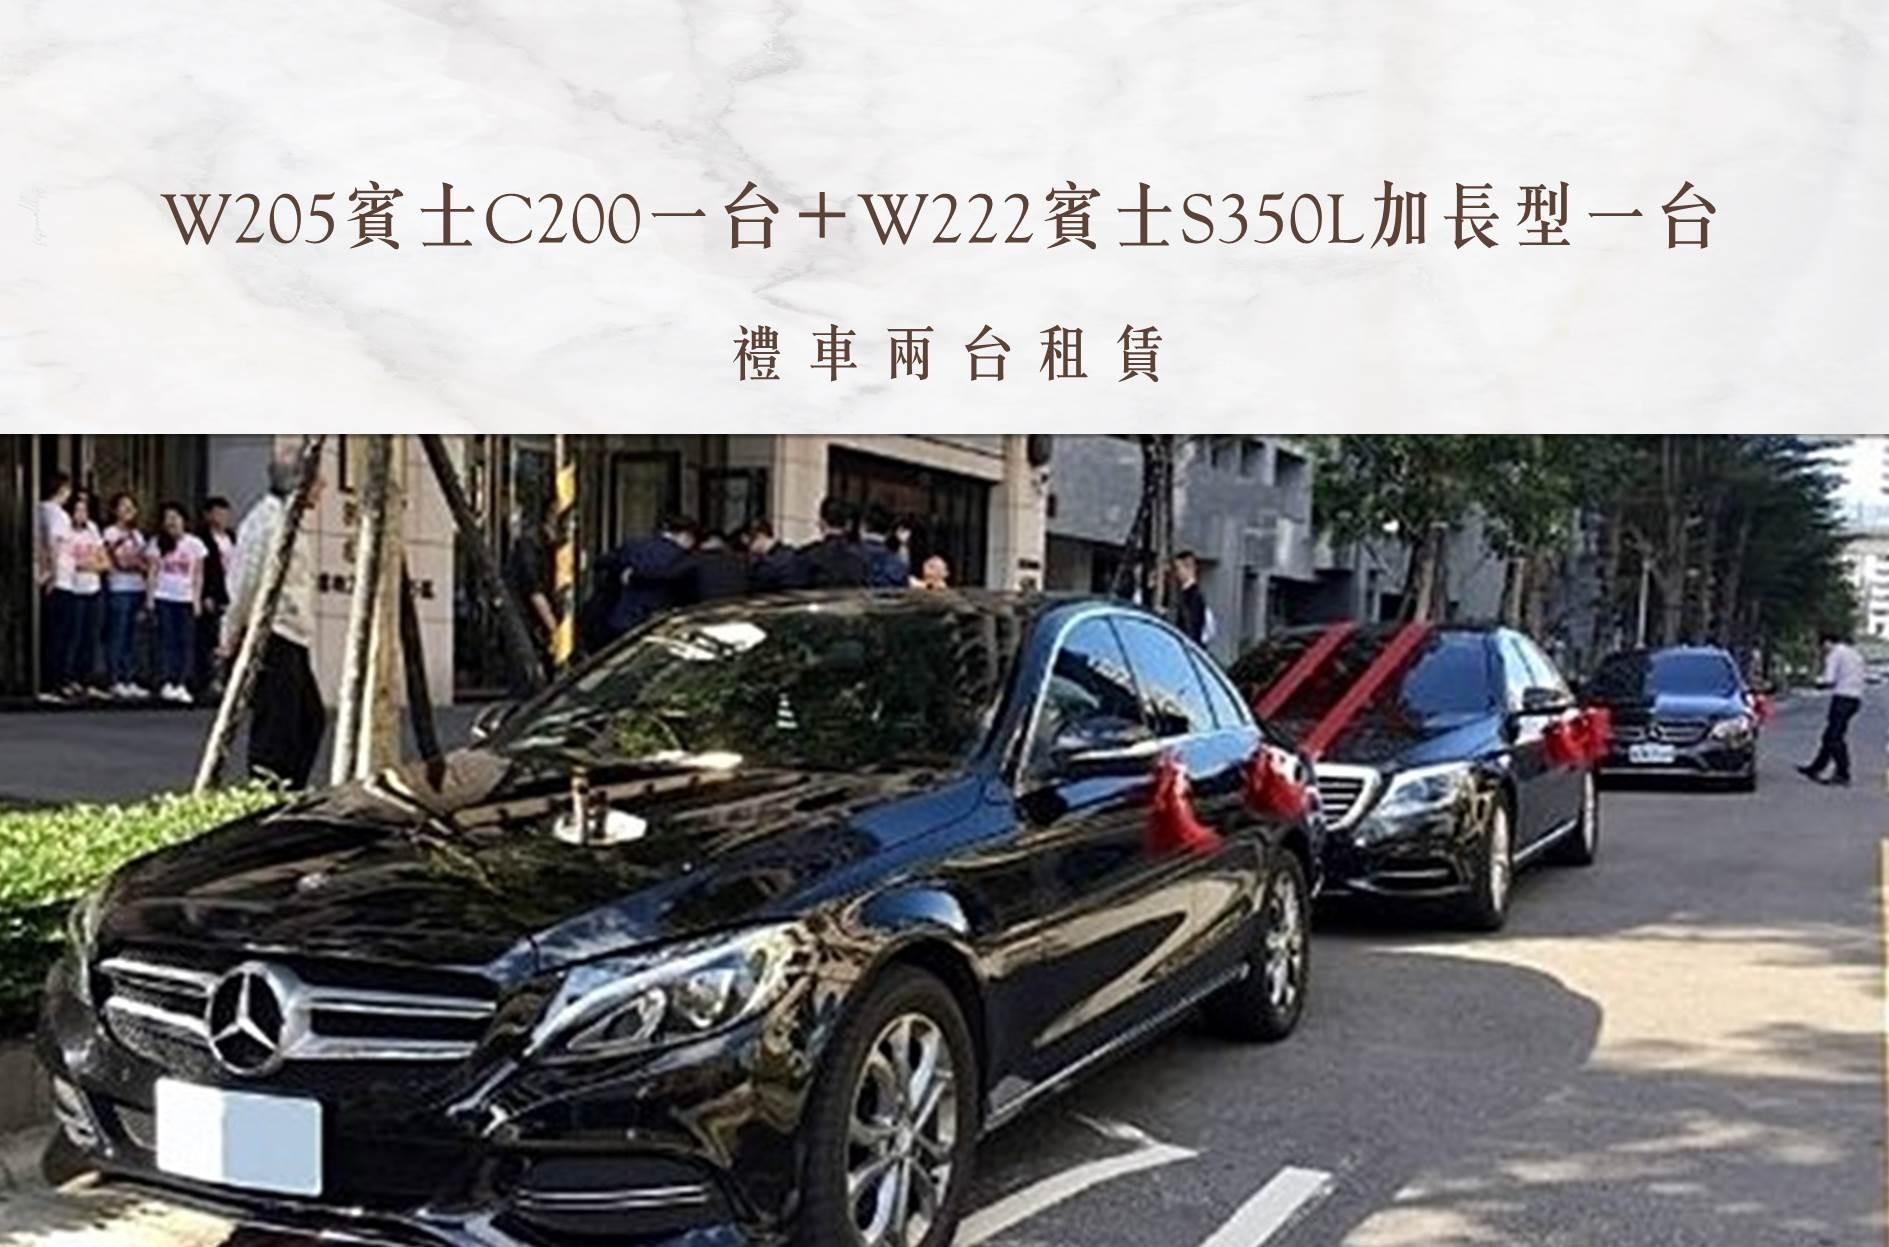 W205賓士C200一台+W222賓士S350L加長型一台